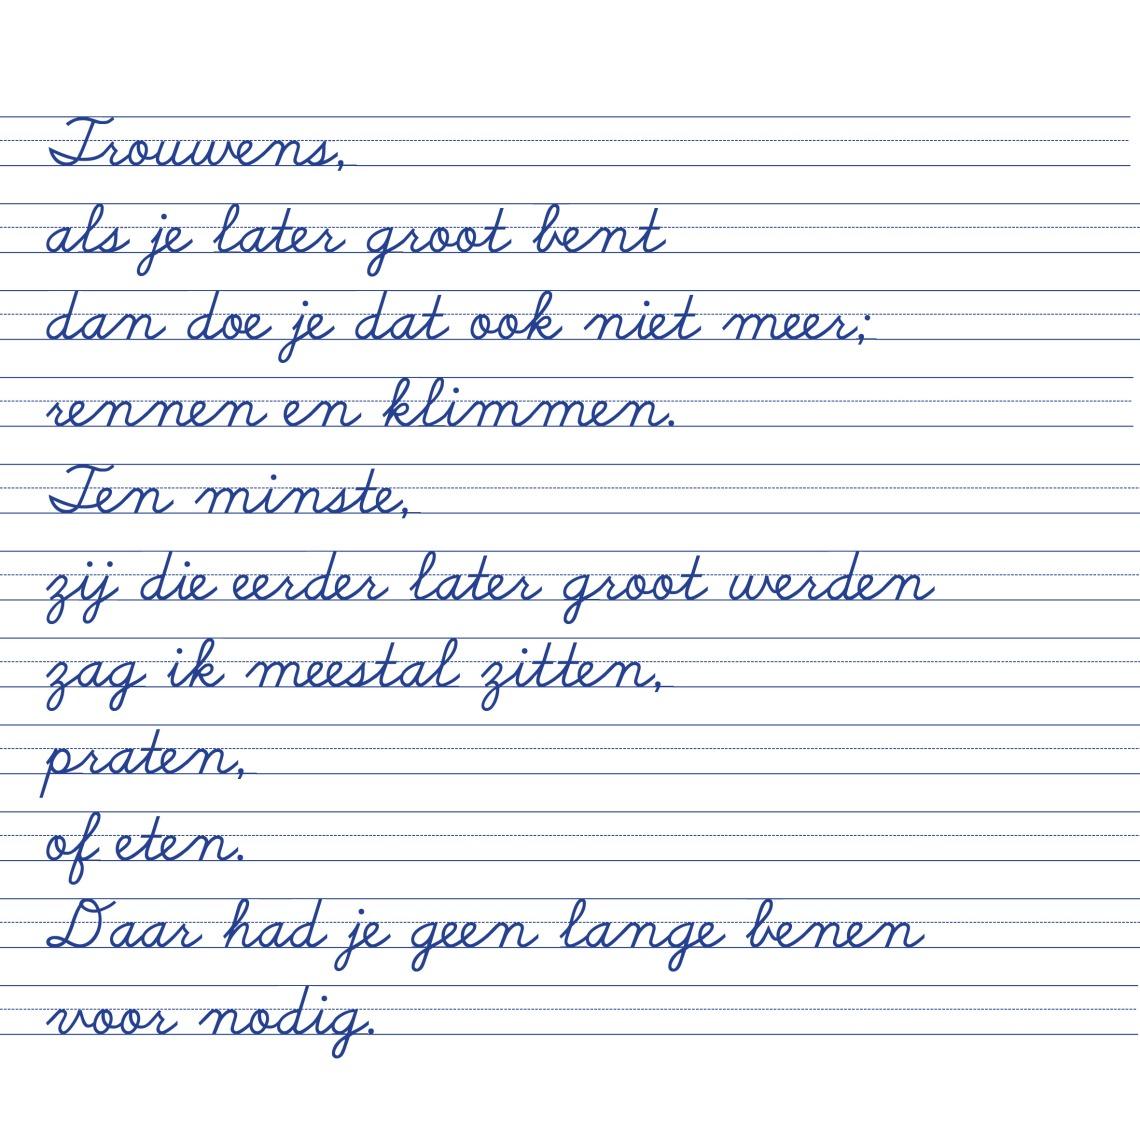 Gedicht_Benen4